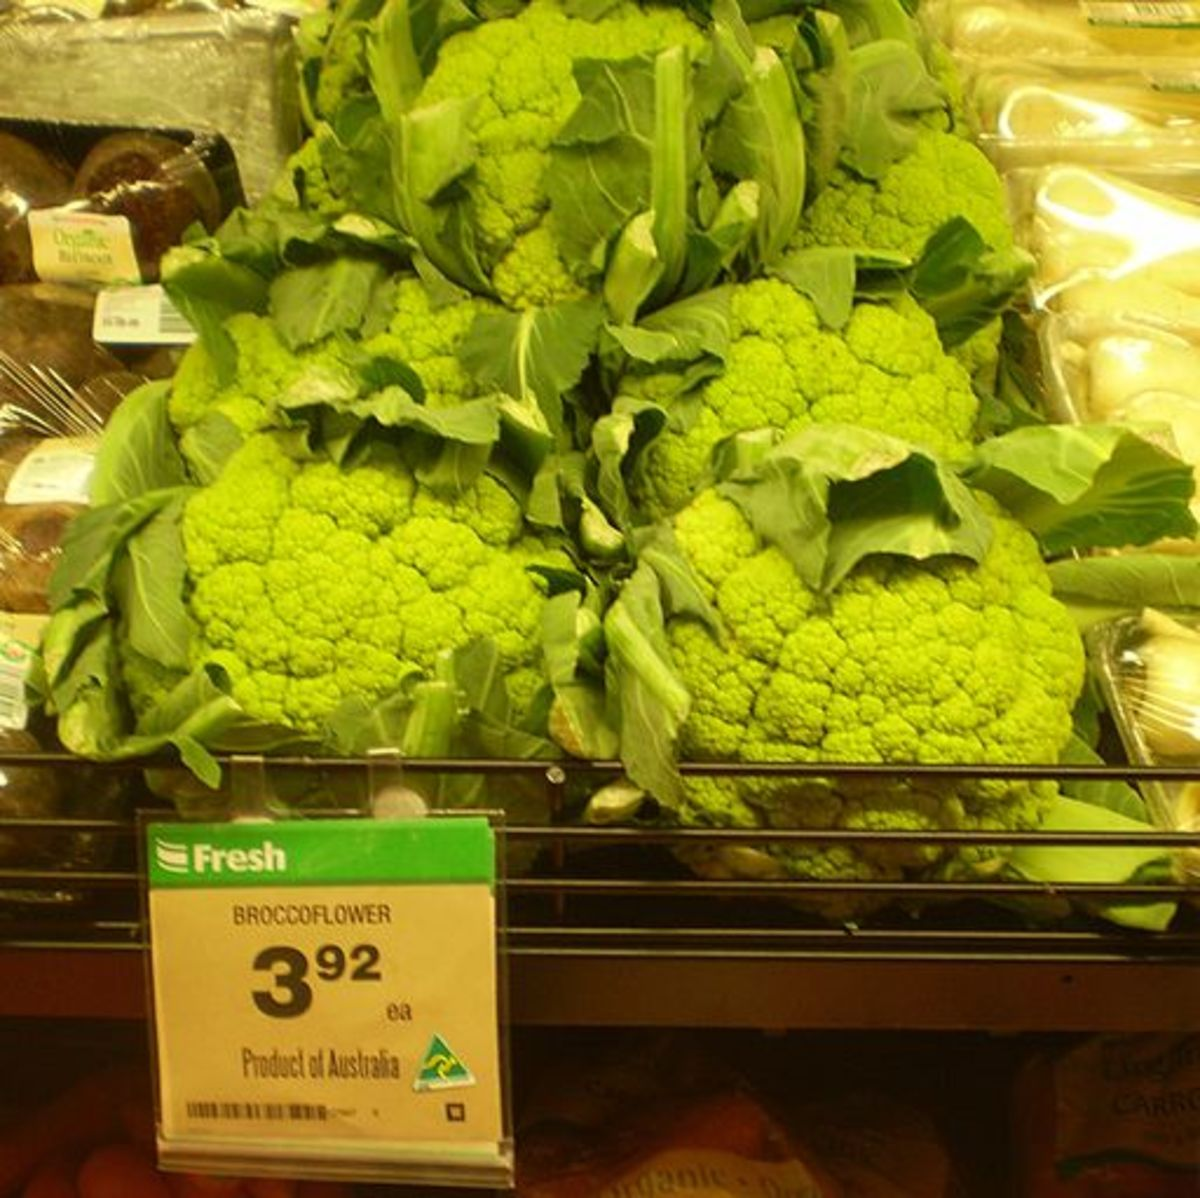 Broccoflower in Australian supermarket